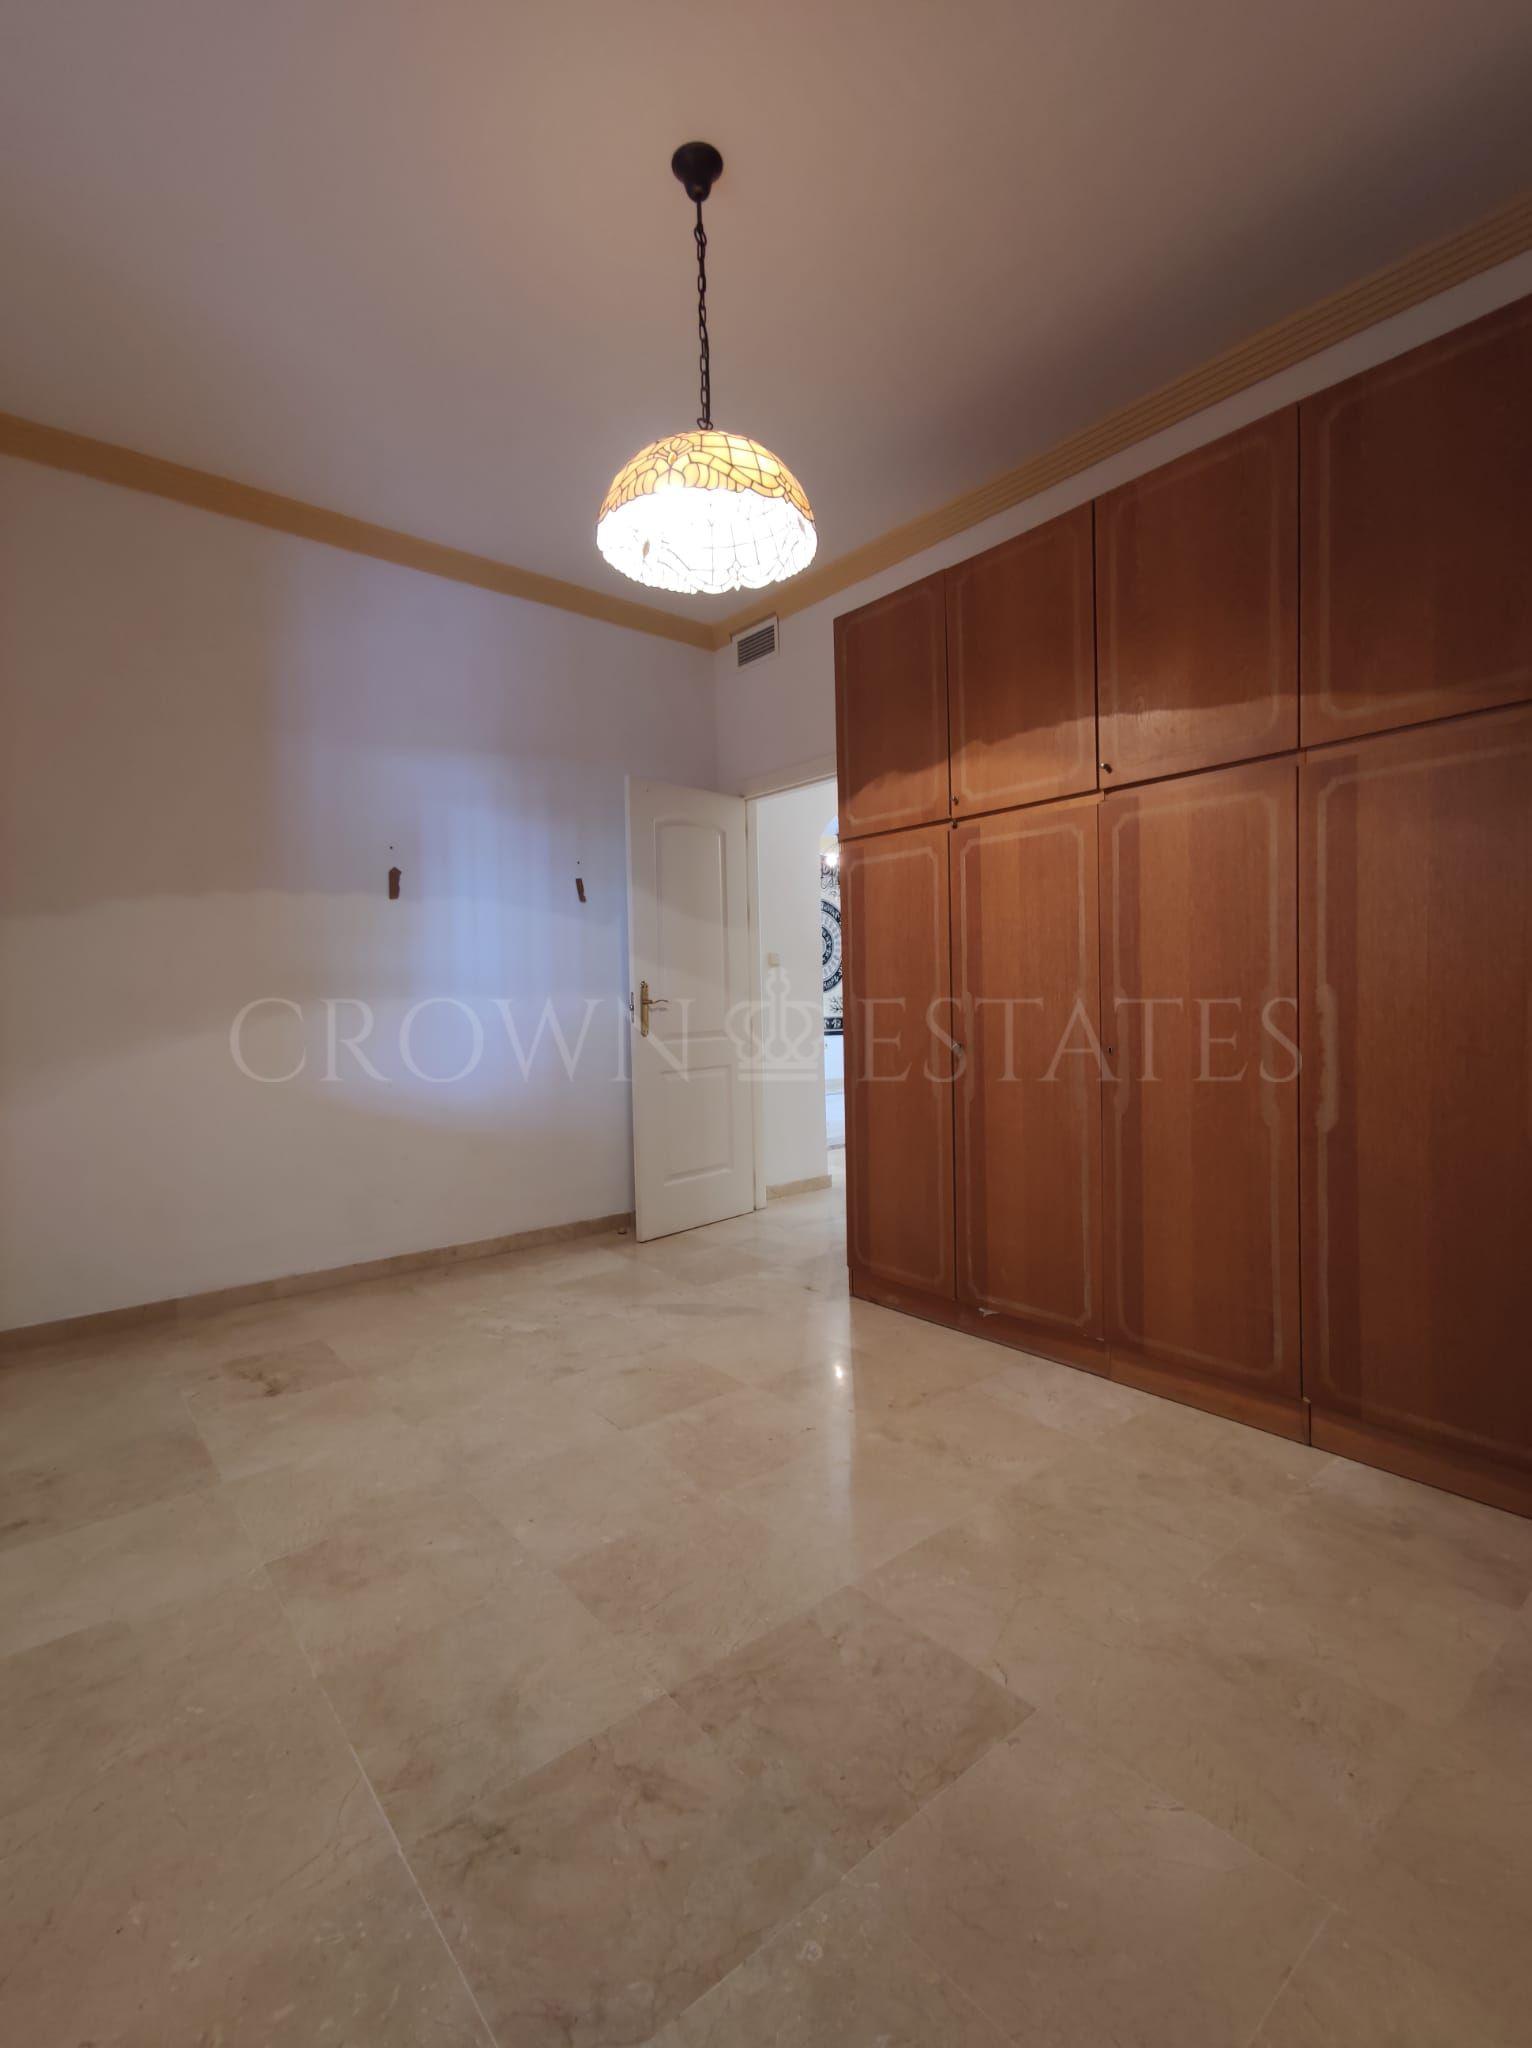 Apartment in River Garden, Nueva Andalucia